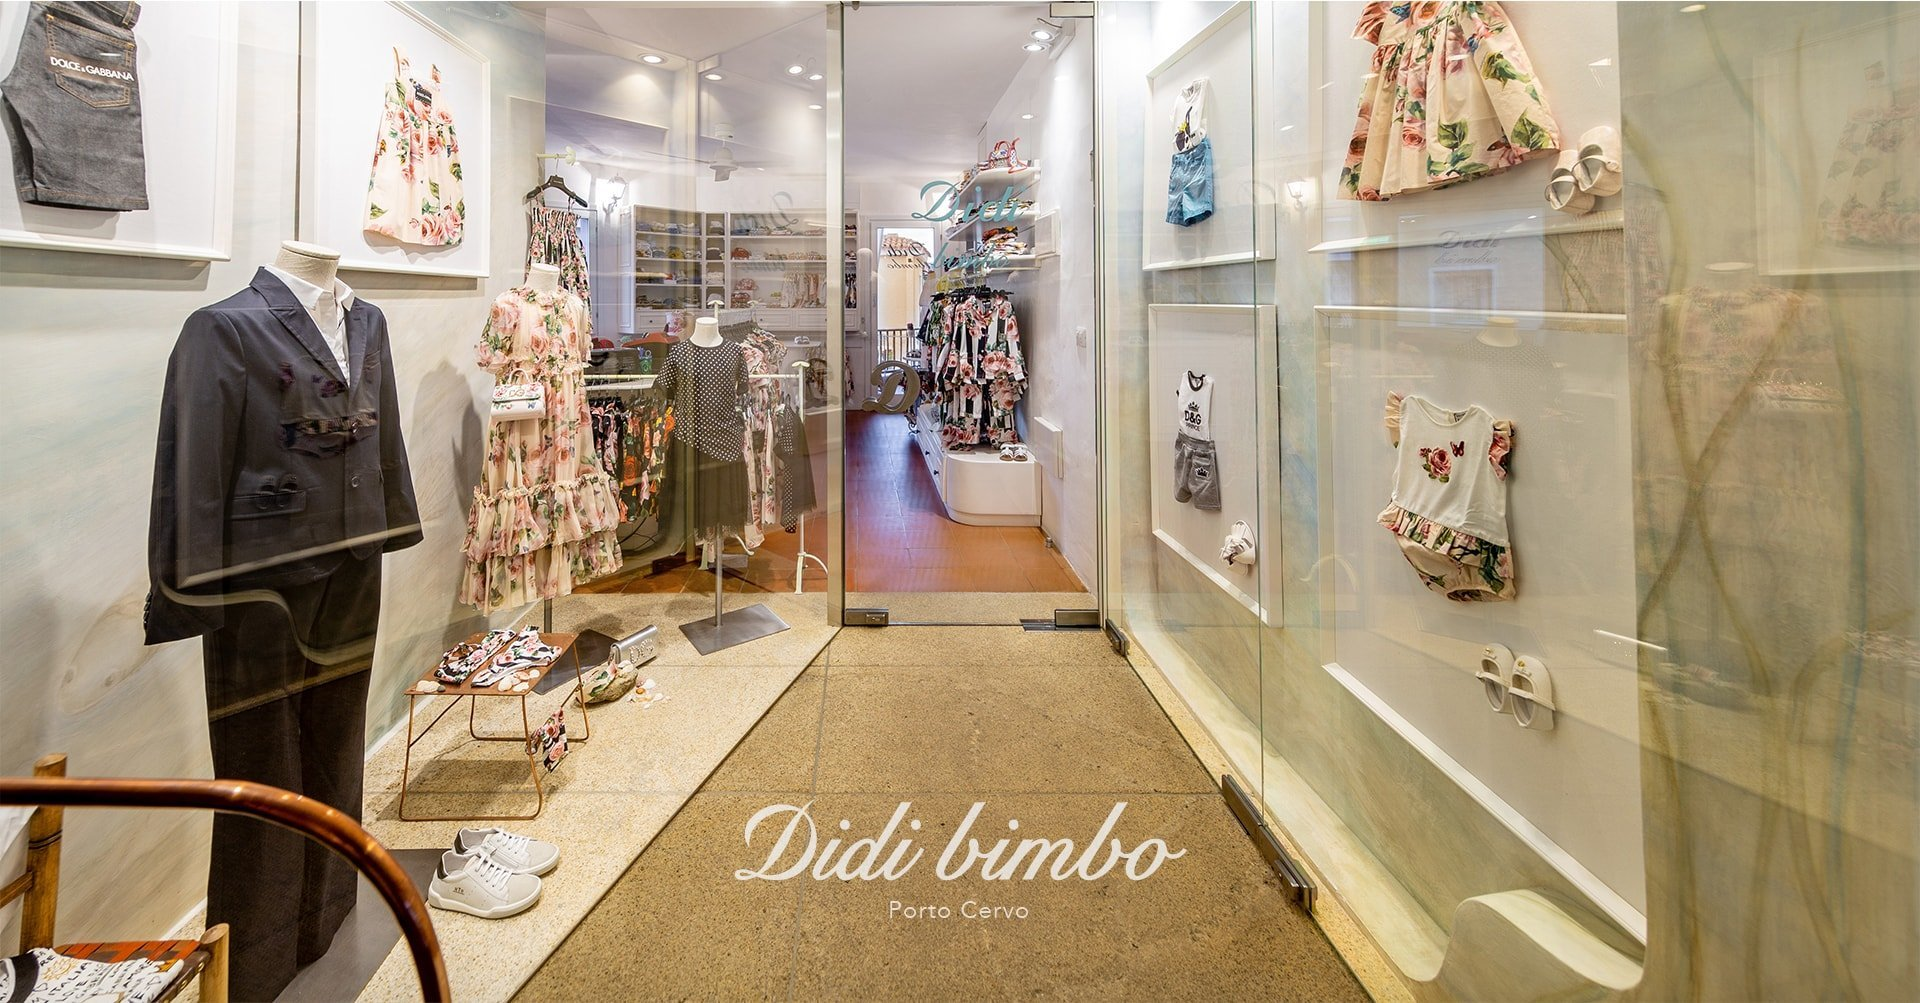 https://shop.didibimbo.com/media/didibimbo-vetrina-shop-porto-cervo-1.jpg